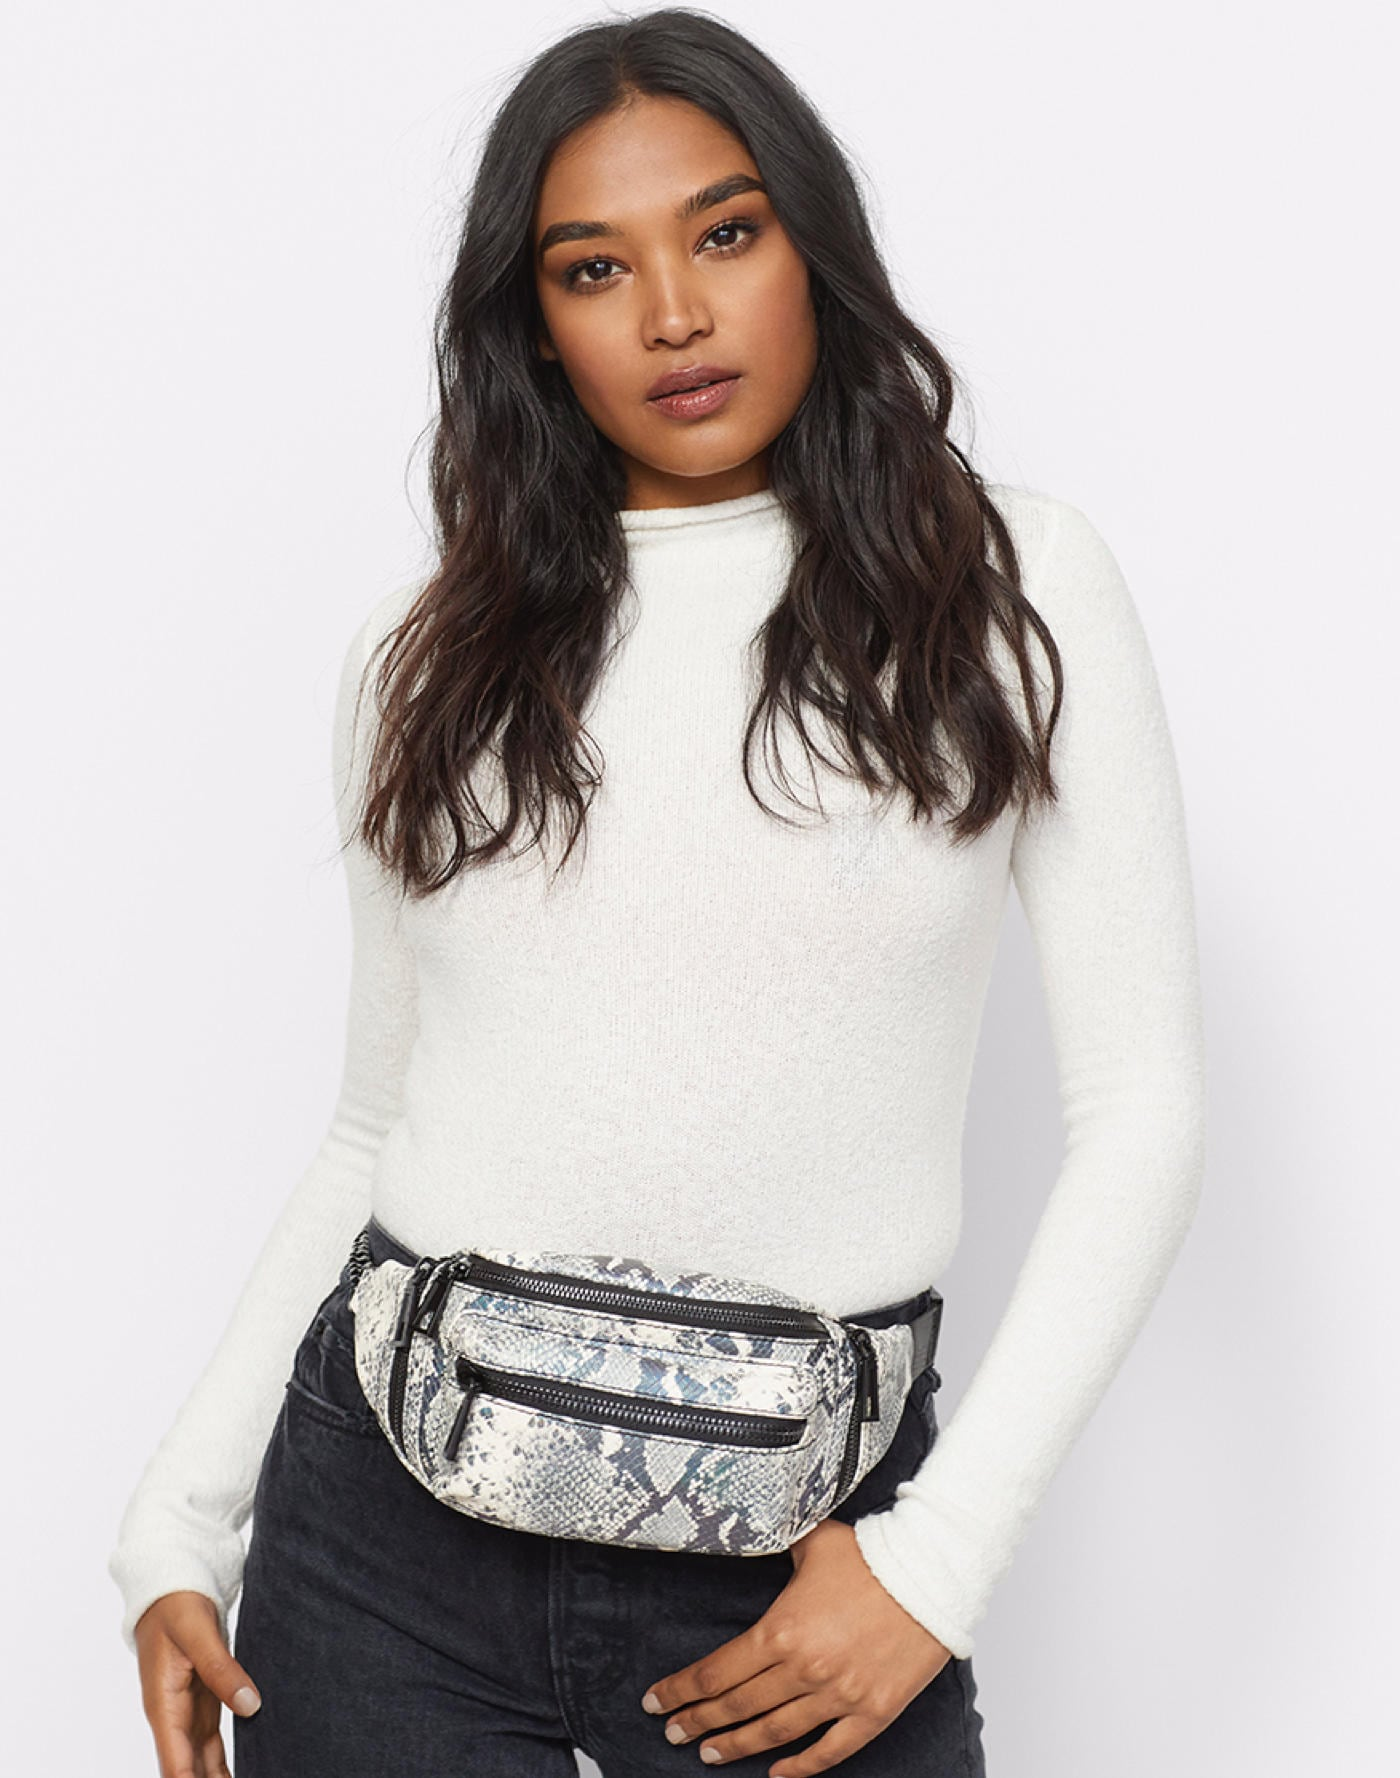 7864300b56ee Women's Purses and Handbags   Purses And Bags   ALDO US   Aldoshoes ...